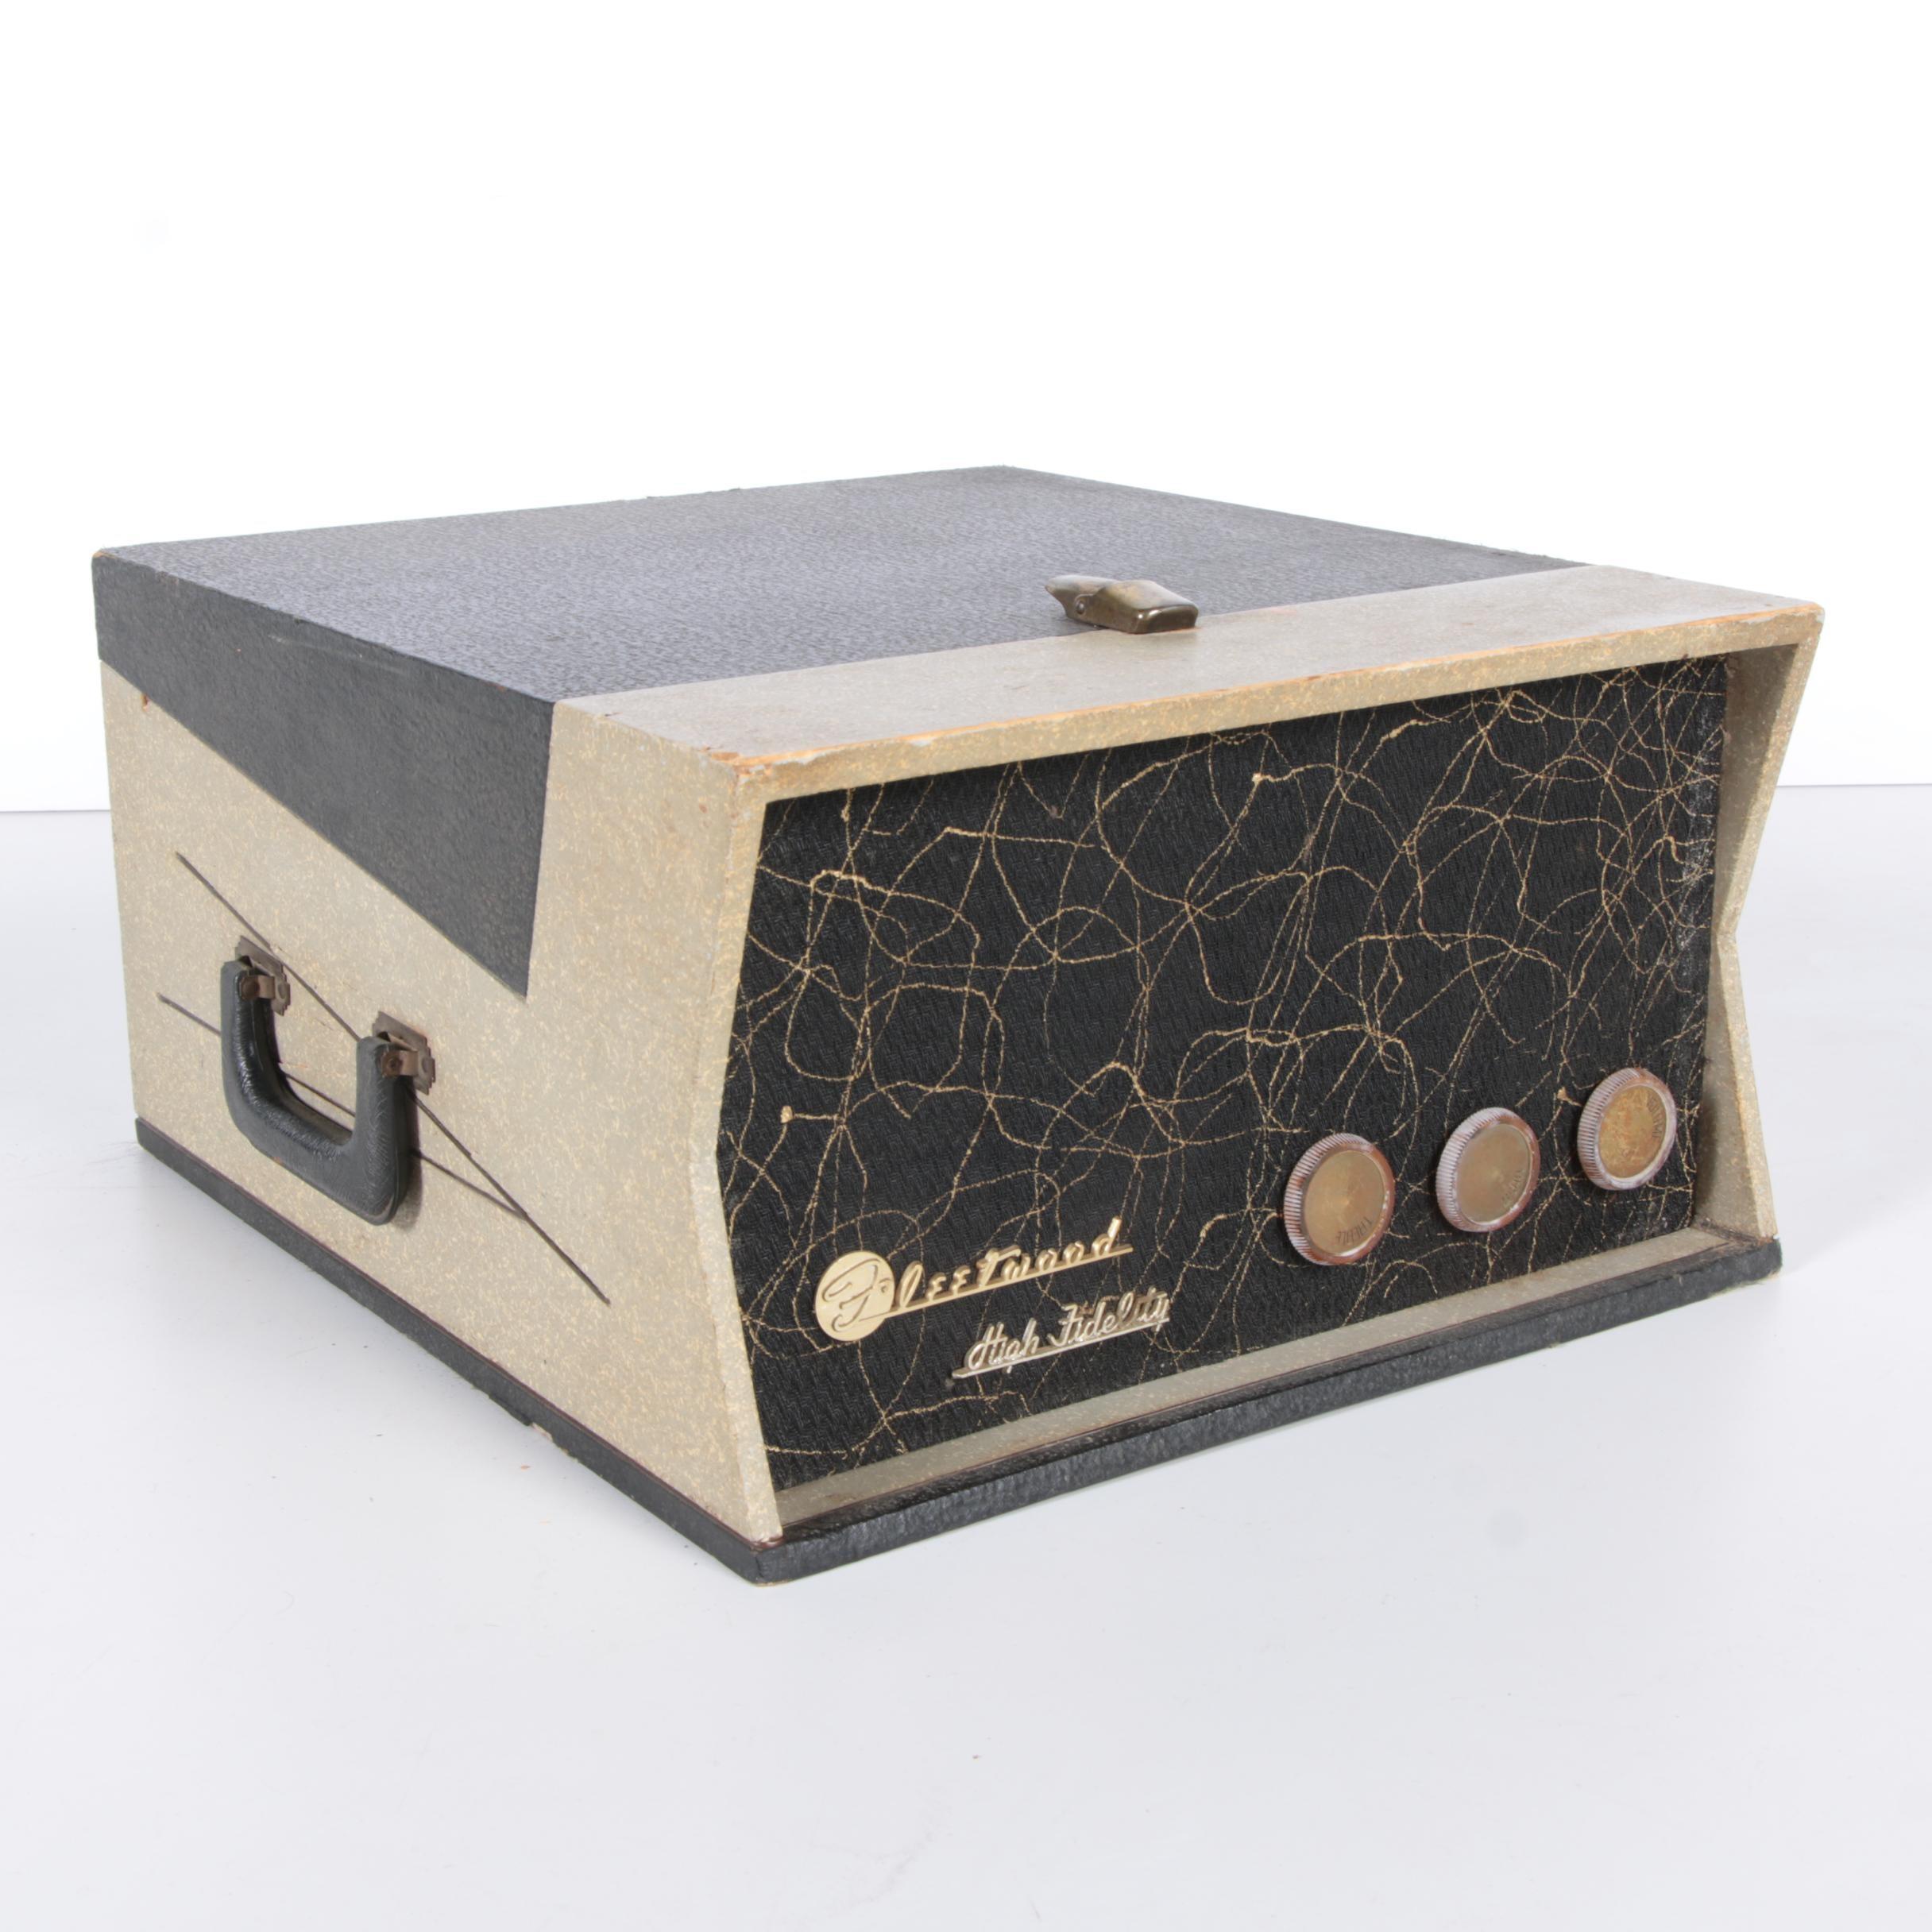 Vintage Fleetwood Model 670 Portable Turntable